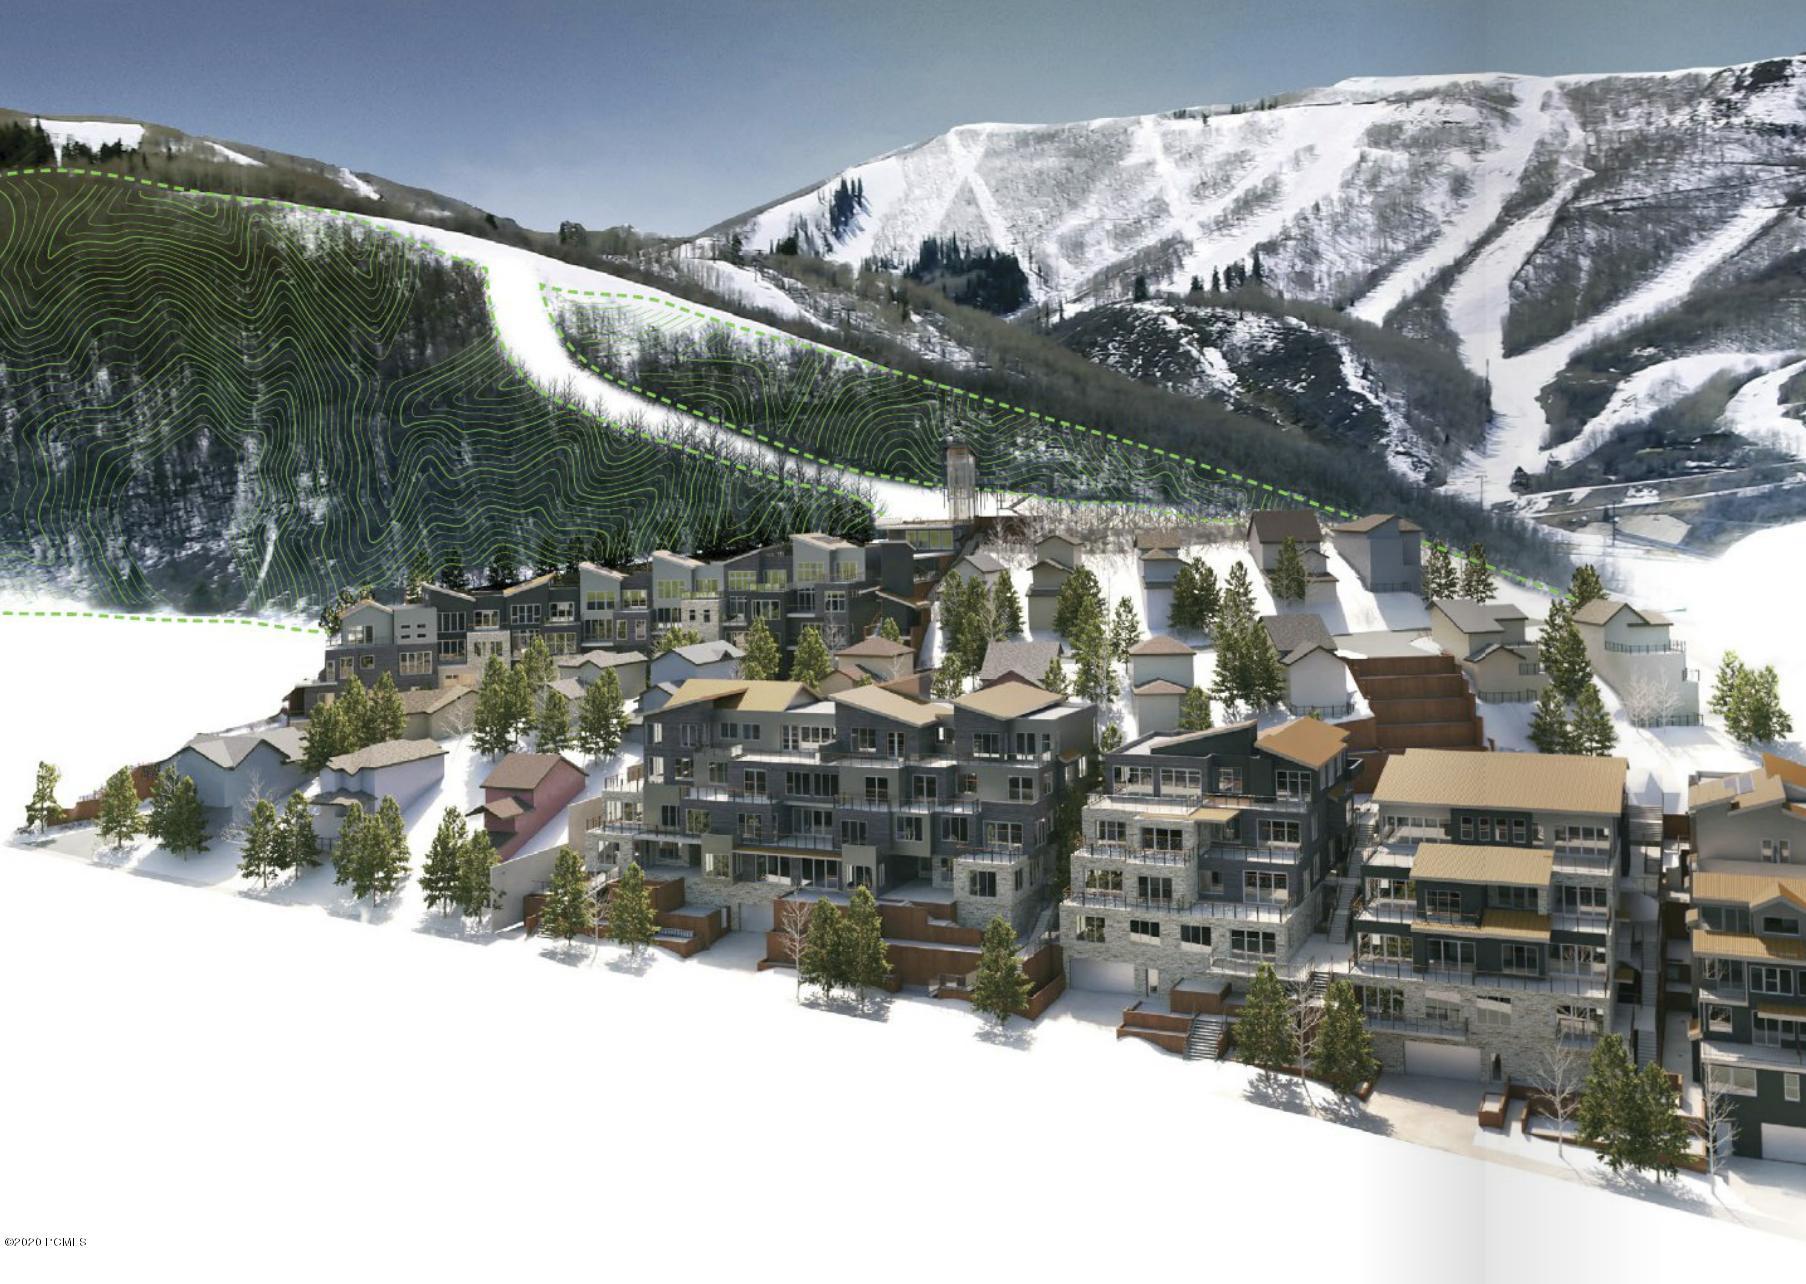 1271 Lowell Avenue, Park City, Utah 84060, 3 Bedrooms Bedrooms, ,3 BathroomsBathrooms,Condominium,For Sale,Lowell,12000316